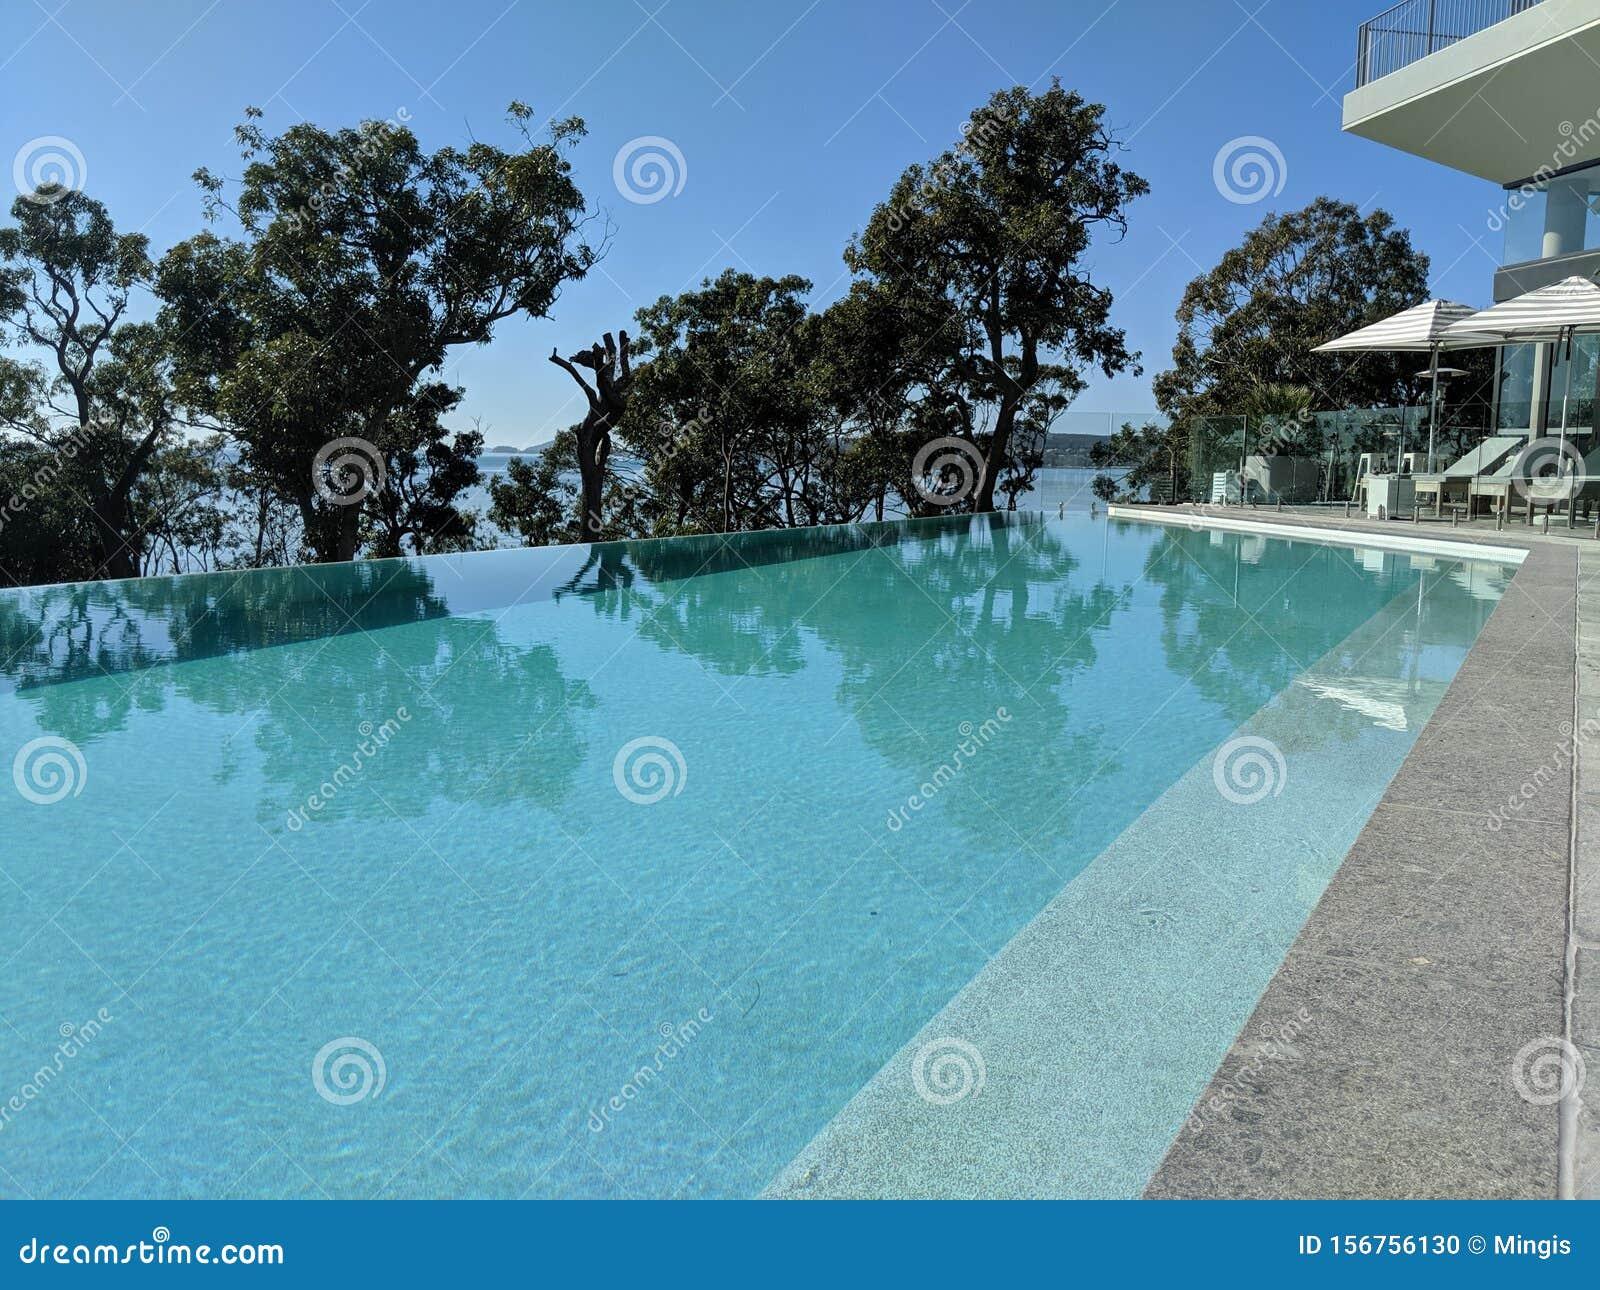 Hotel Infinity Pool Overlooking The Ocean